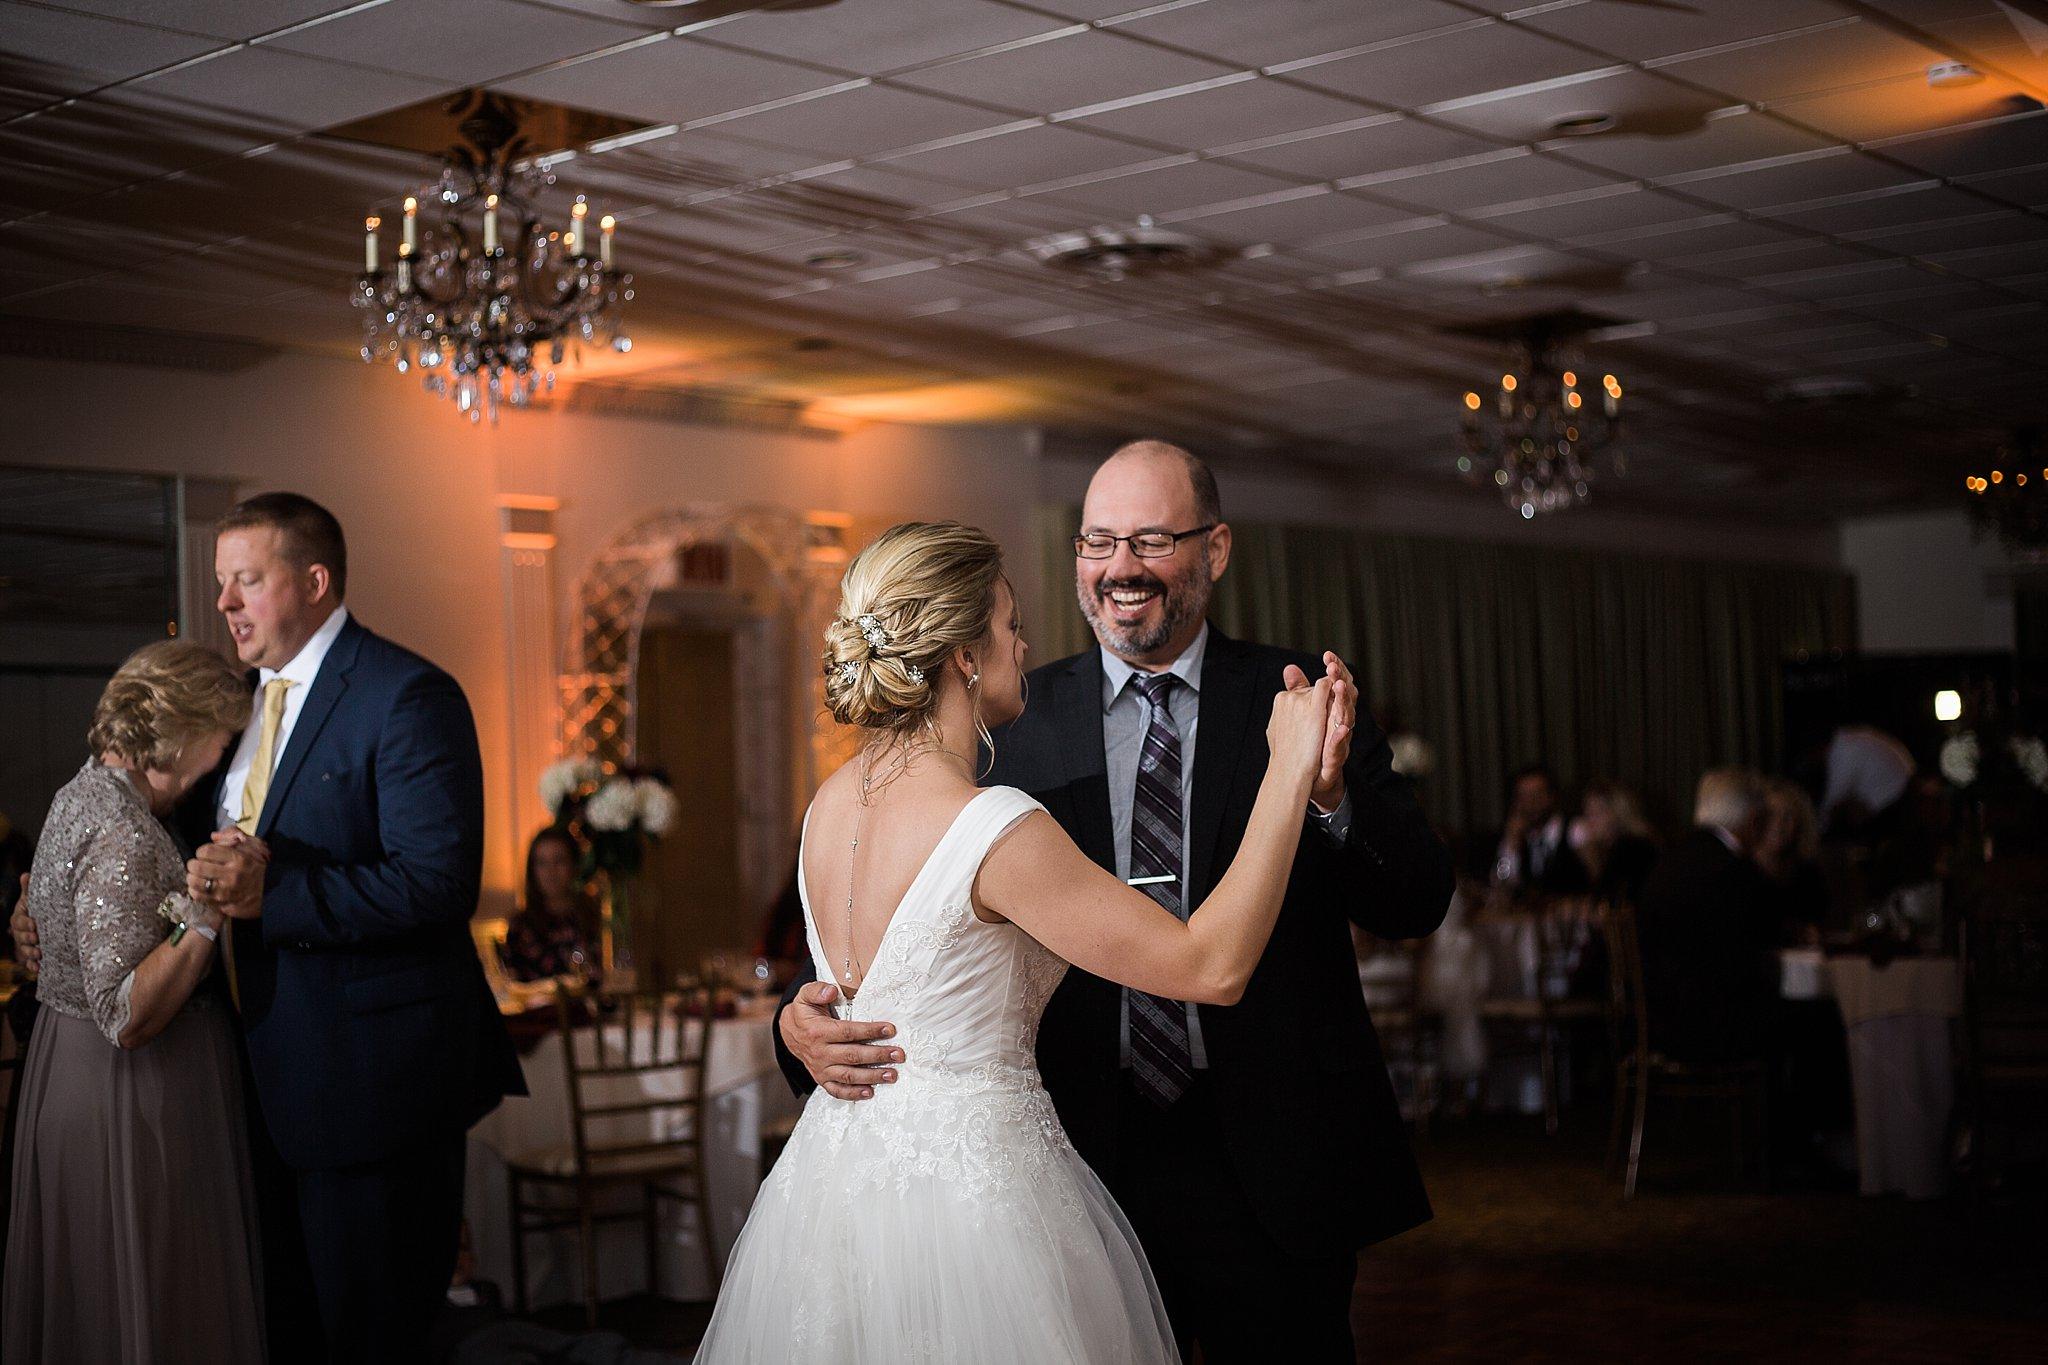 New Windsor New York Hudson Valley New York Wedding Photographer 71.jpg